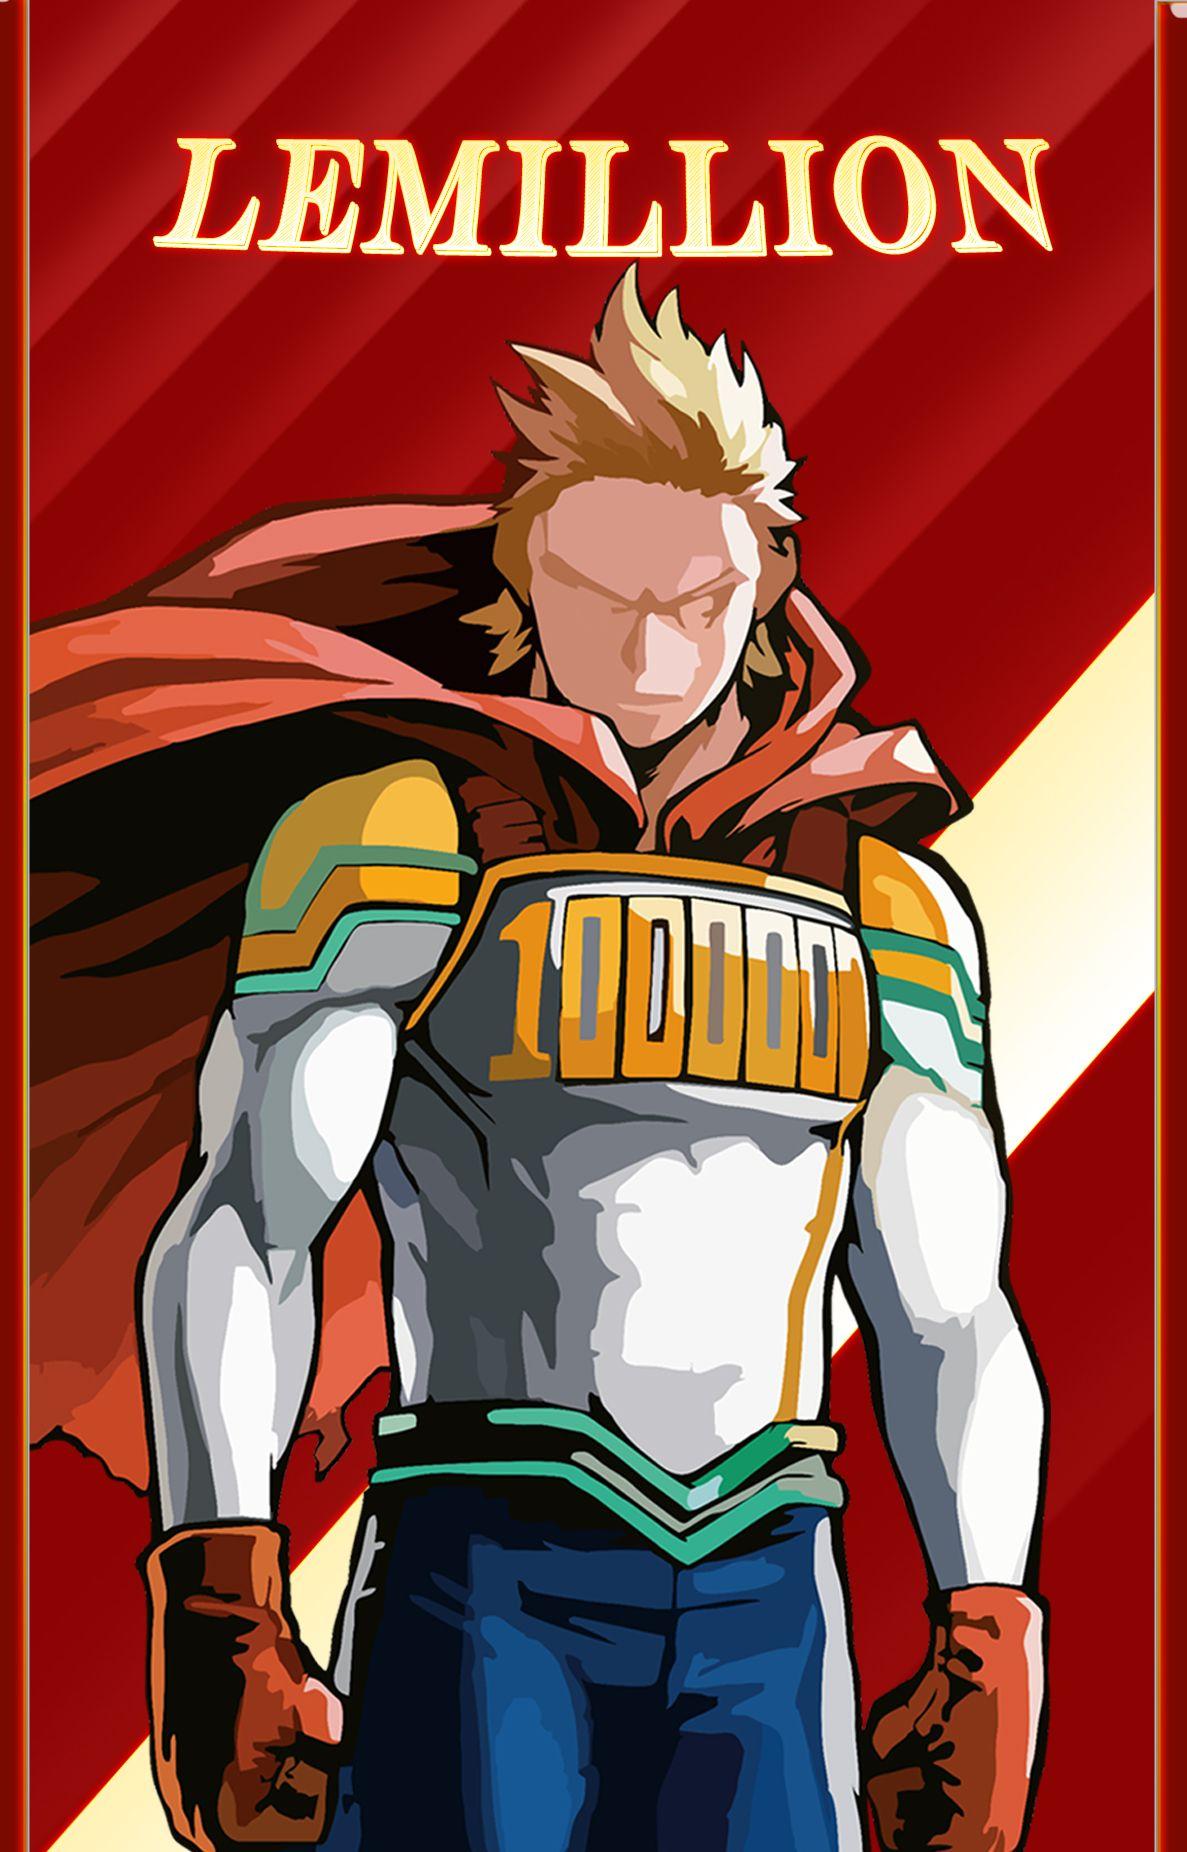 Hero Million Iphone 12 Soft By Ddsmodas In 2021 Hero My Hero Academia Episodes Hero Wallpaper